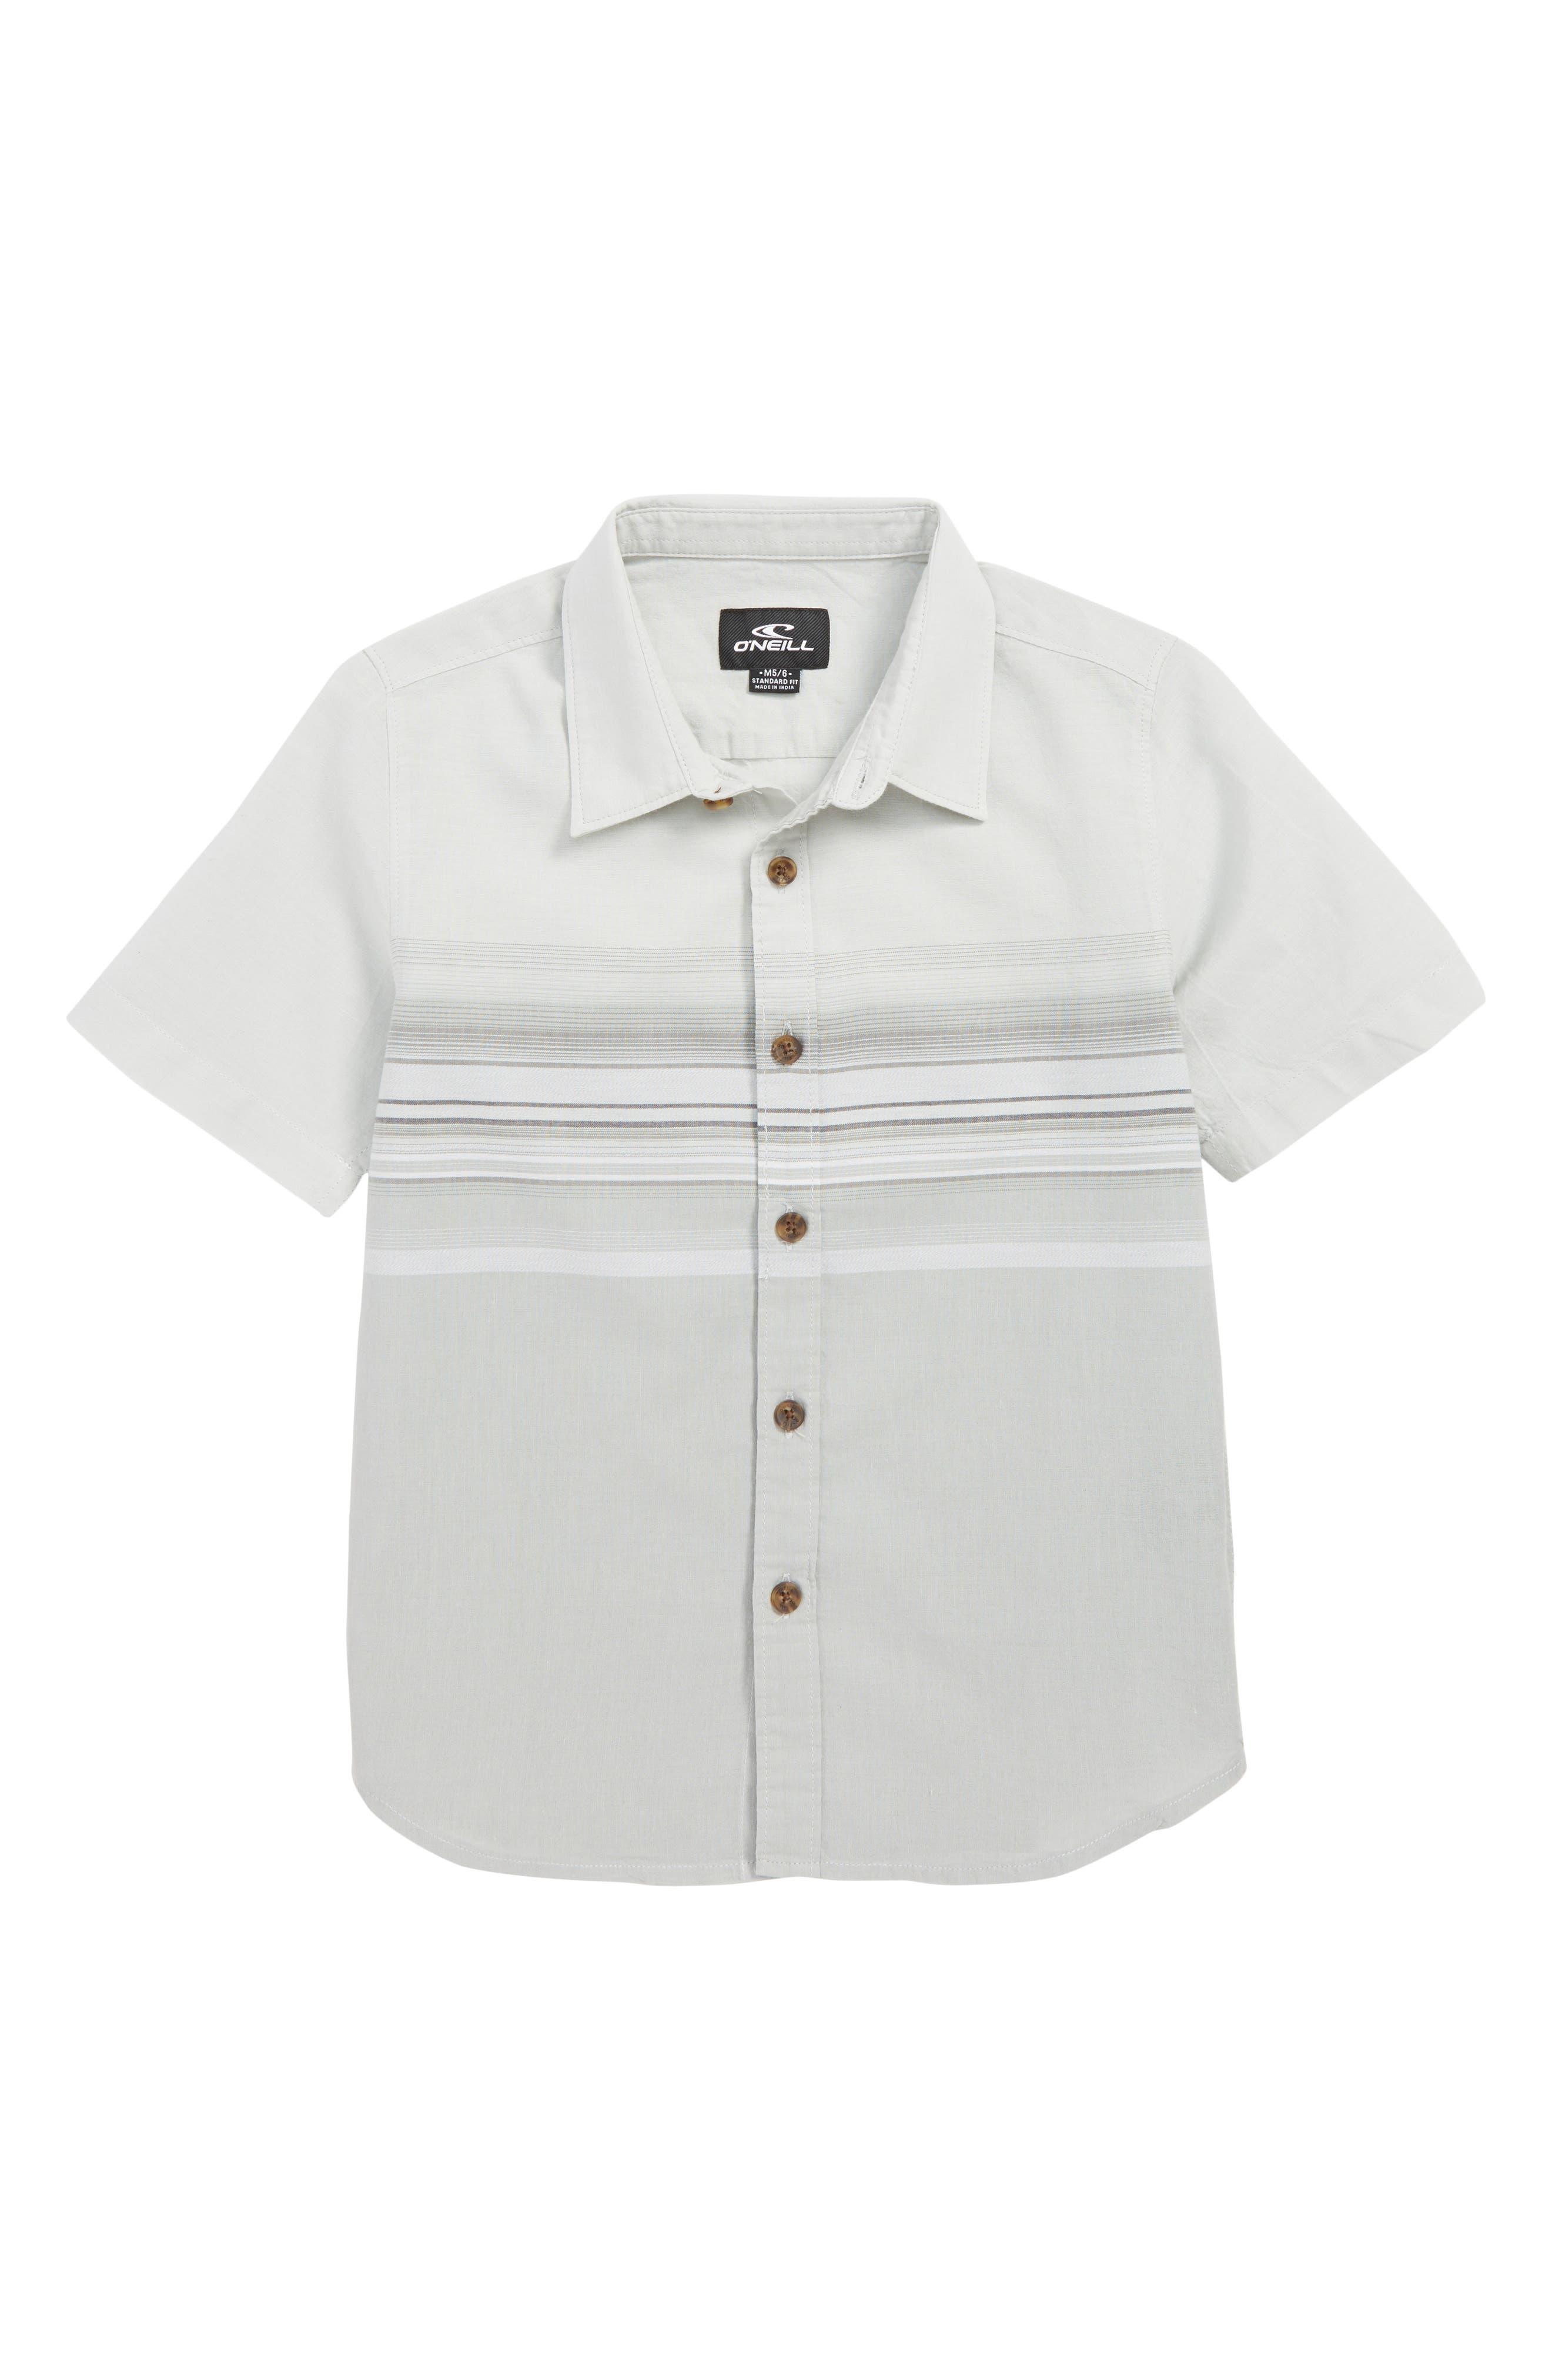 O'NEILL Letting Go Woven Shirt, Main, color, LIGHT GREY